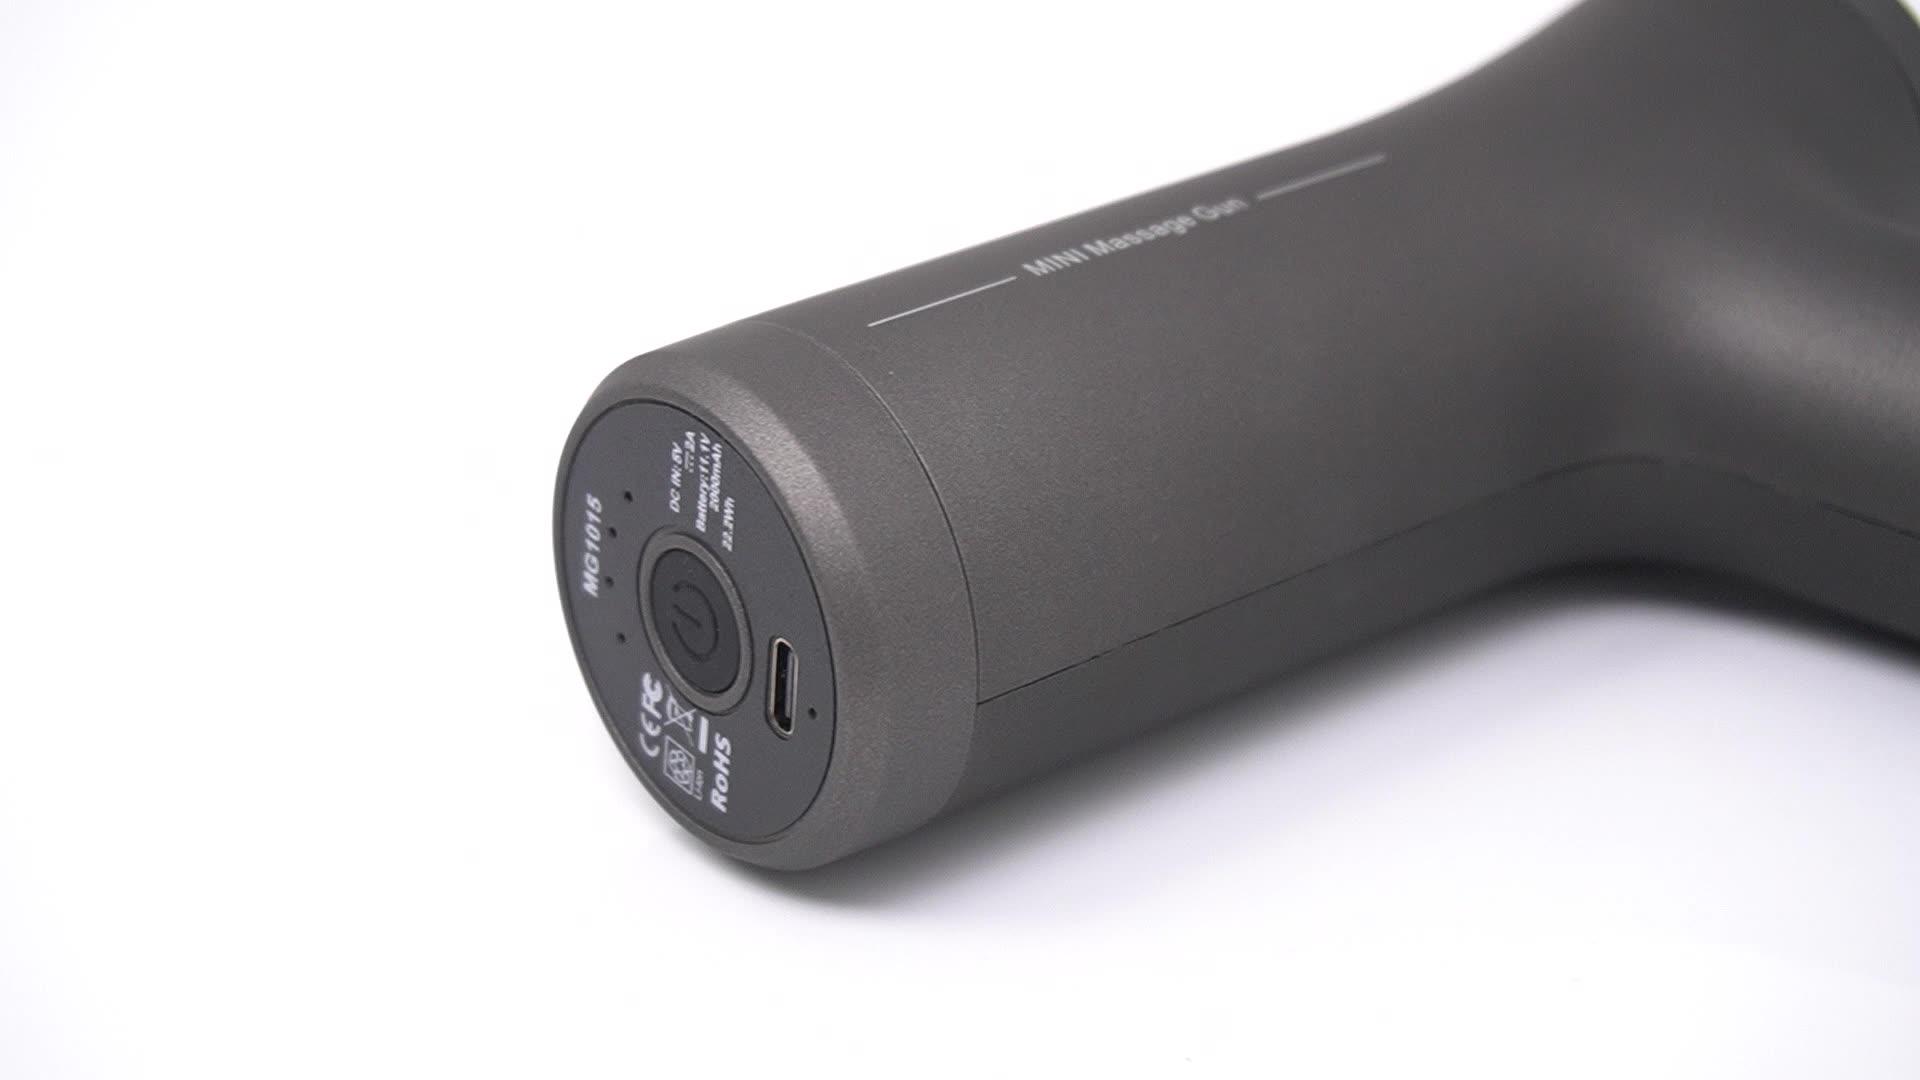 Cincom Brand Muscle Deep Tissue 2020 Mini Brushless Lcd Percussion Massager Cordless Dropship Vibration  Massage Gun